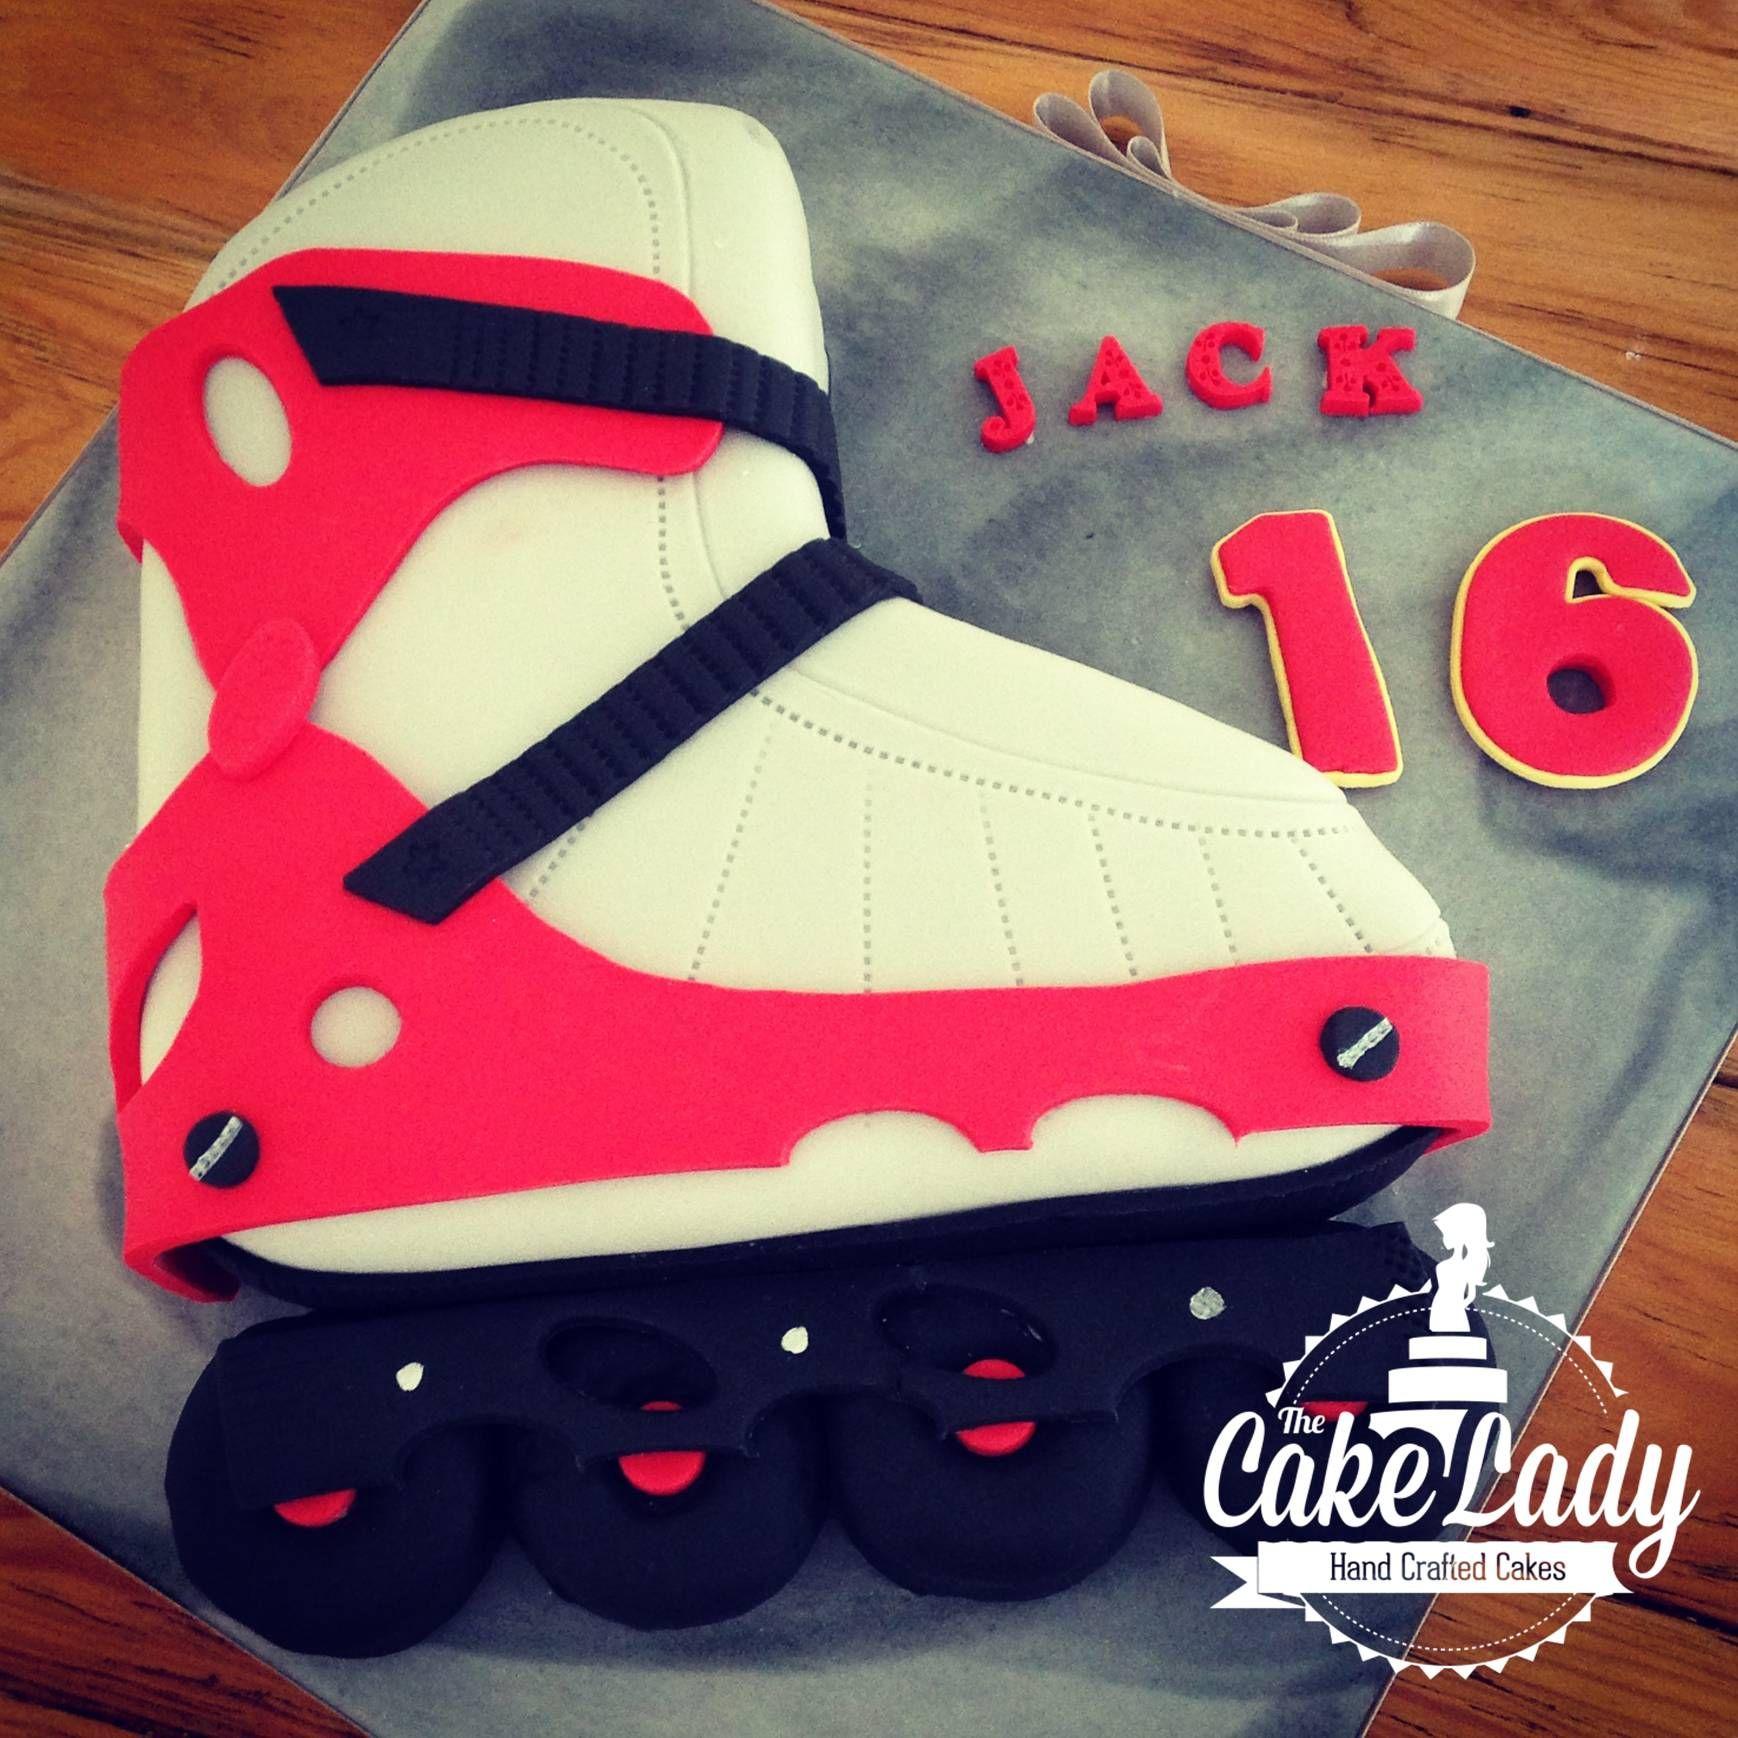 Rollerblade Cake Childrens Birthday Cakes Roller Skate Cake Rollerblade